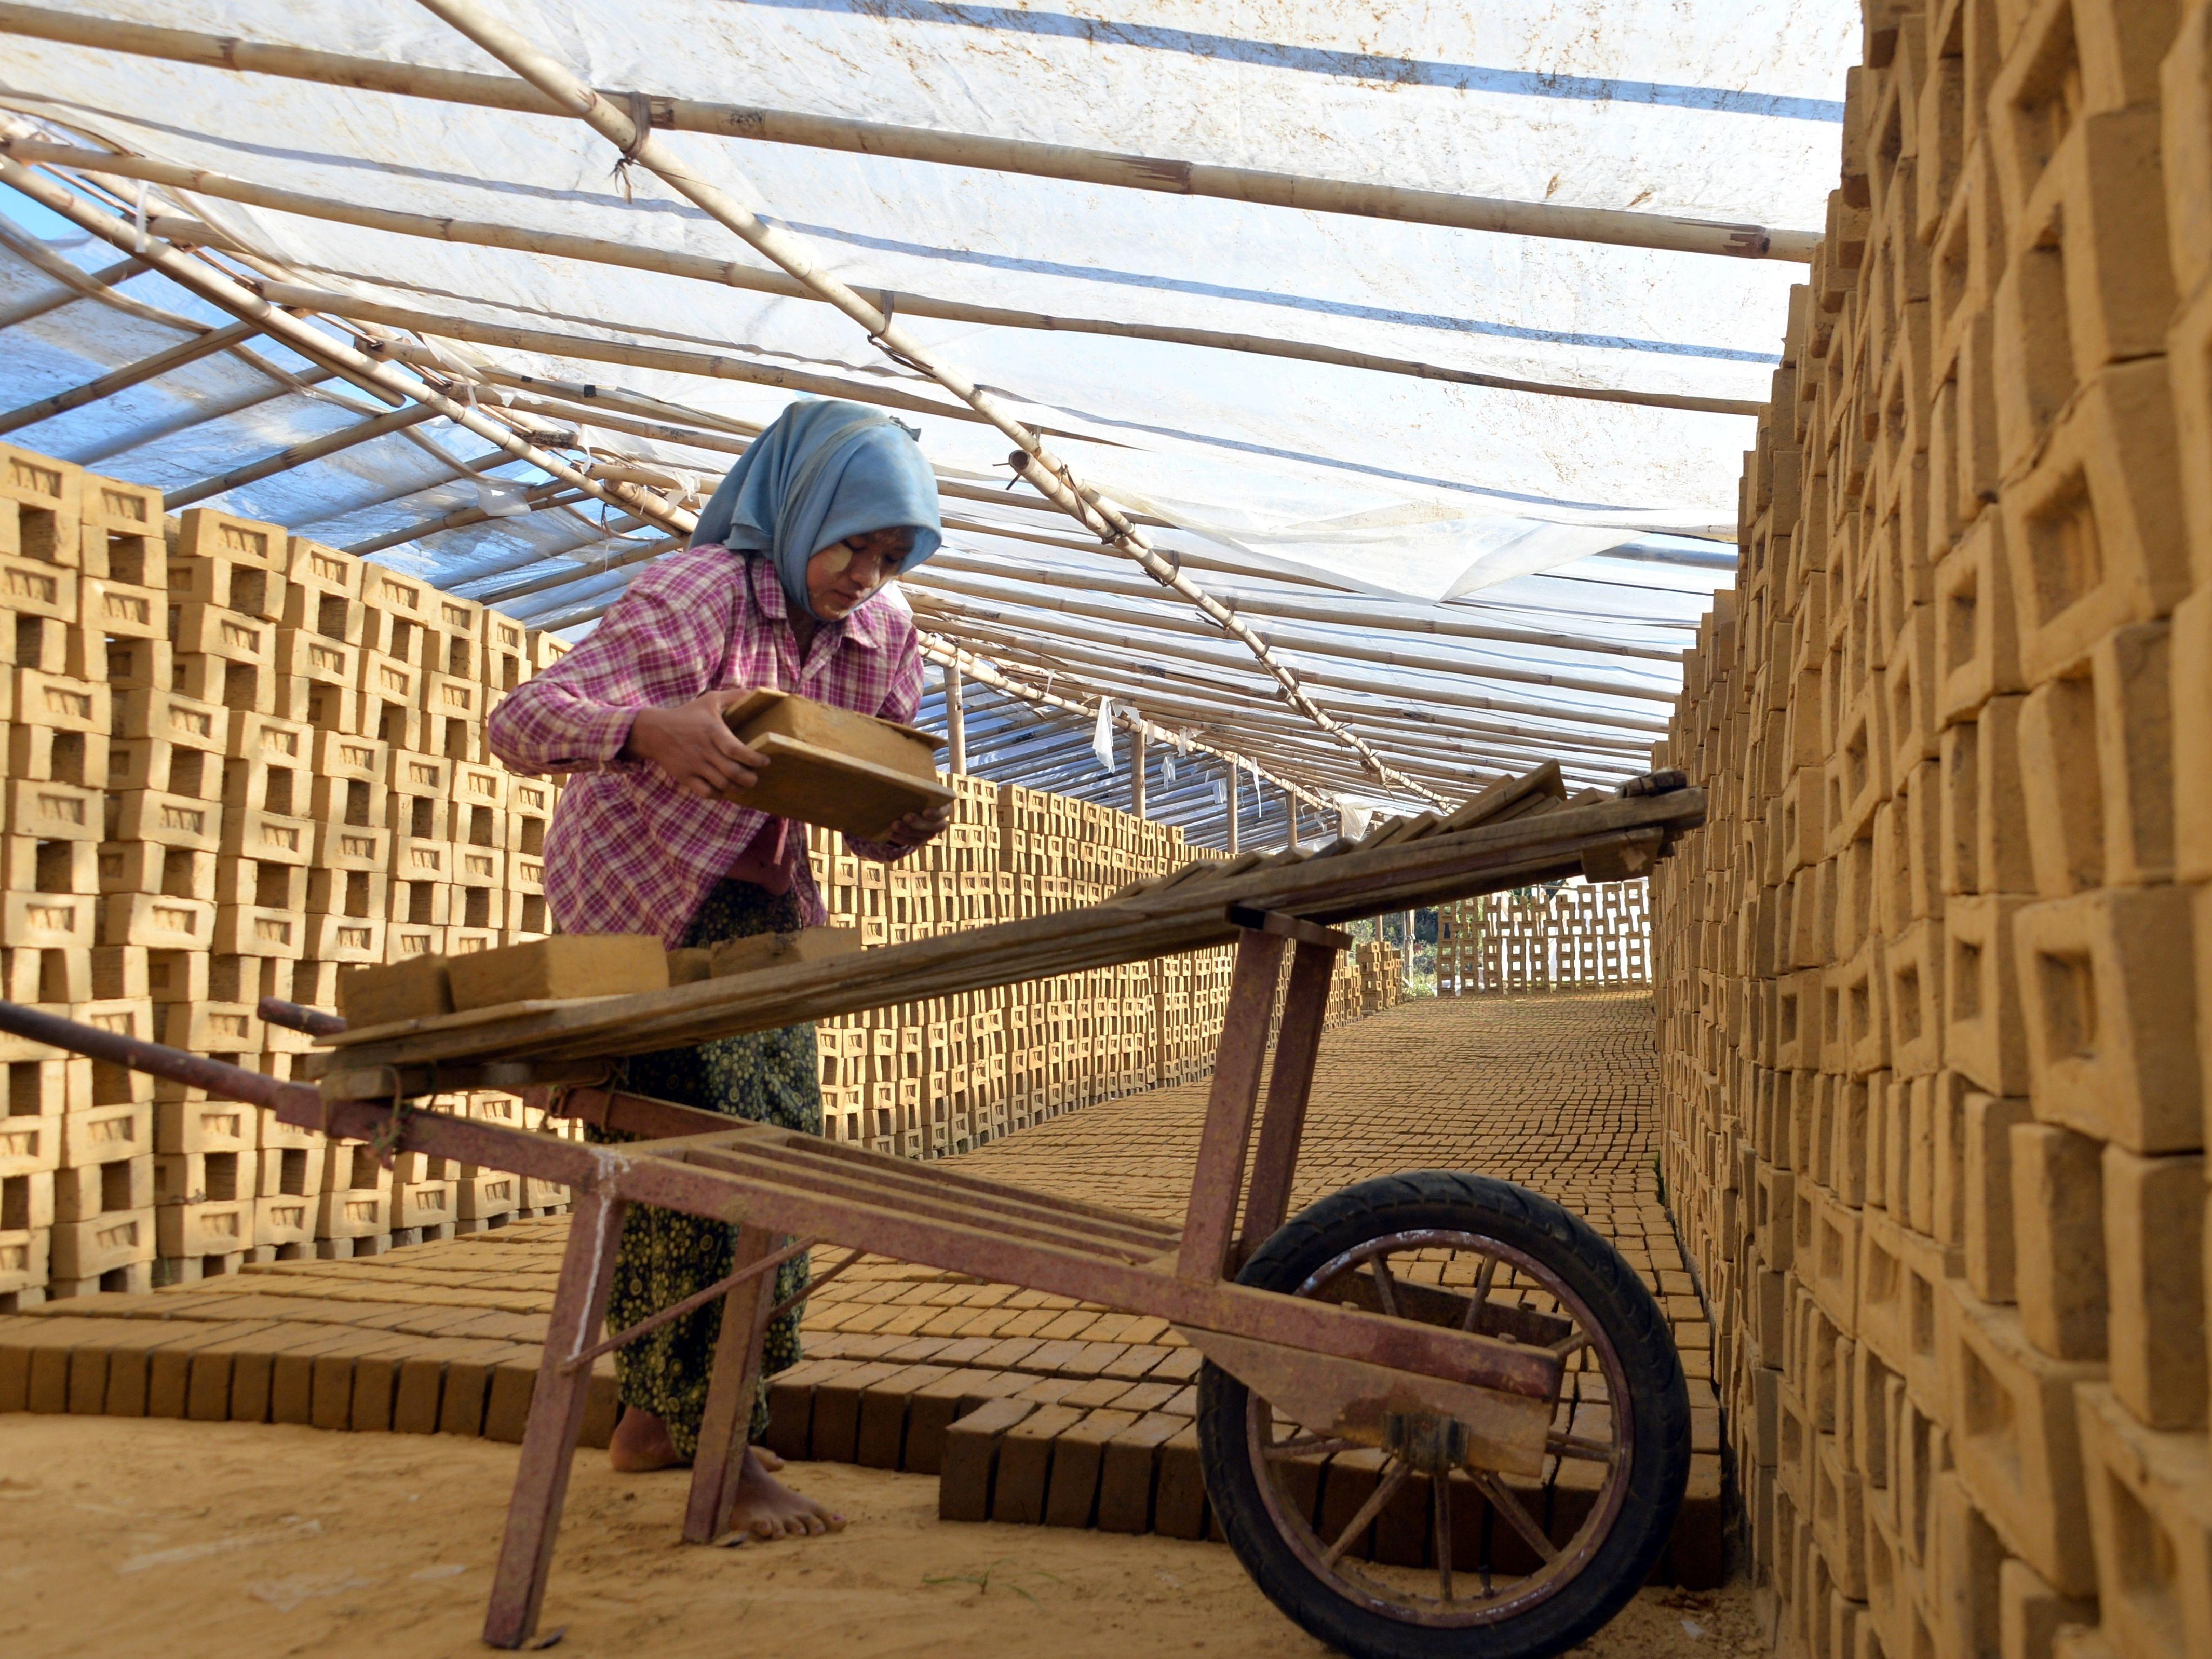 A Myanmar woman works in a brick factory in Naypyidaw, Dec. 5, 2018.